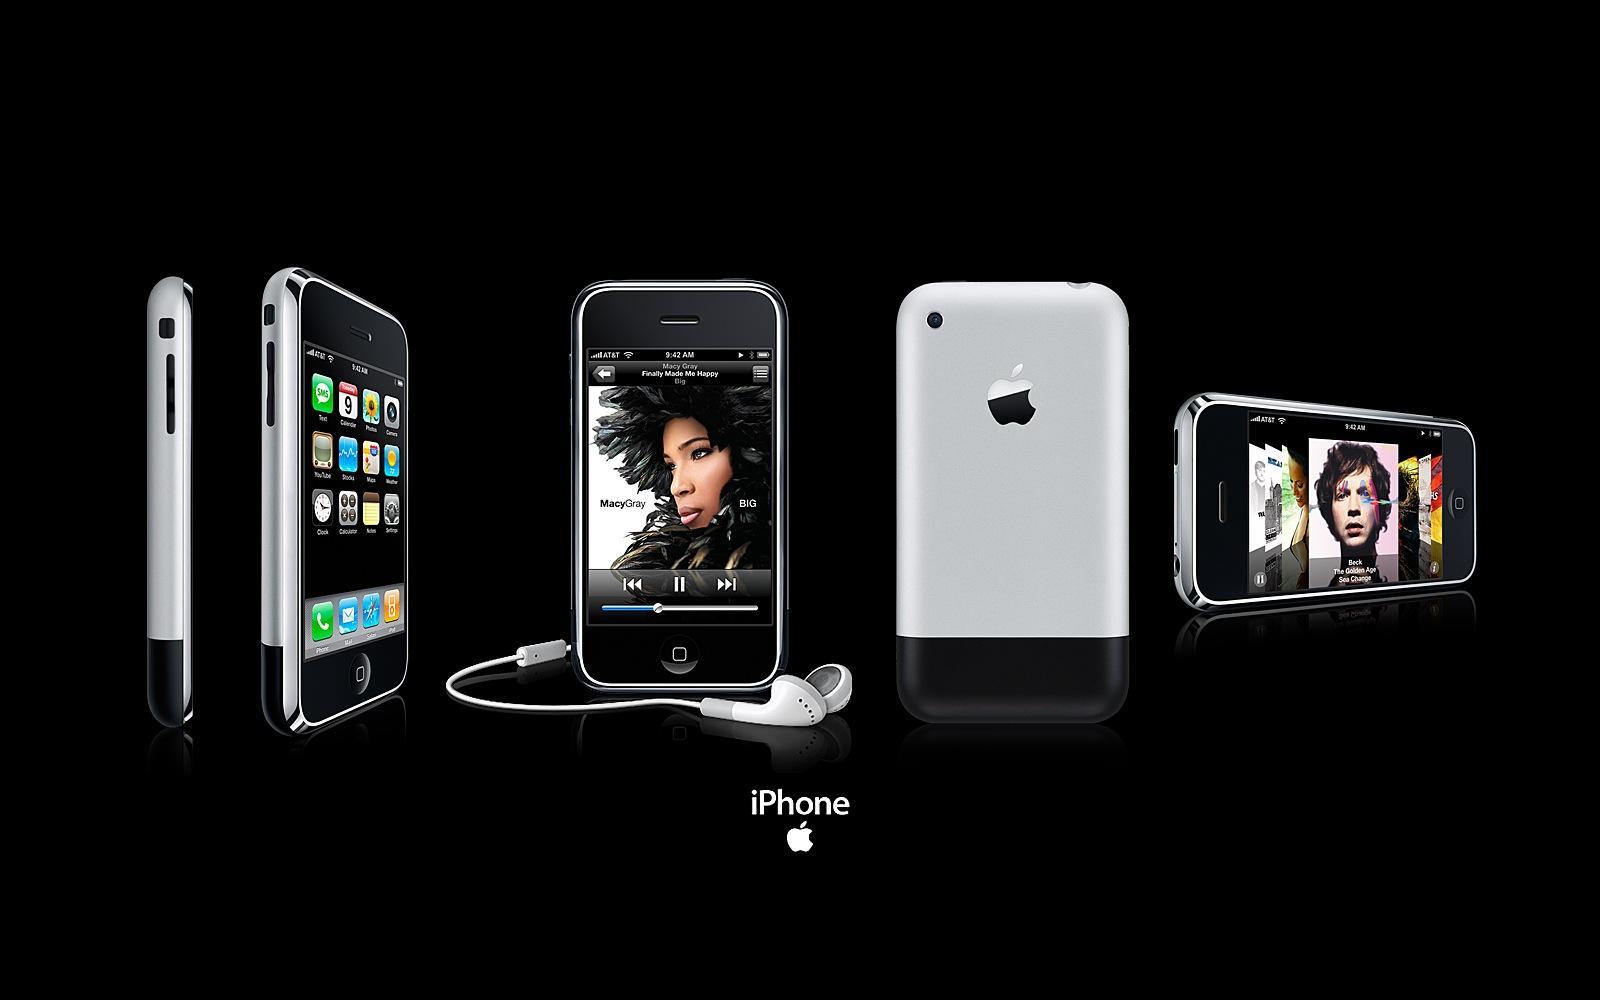 Download iPhone & iPod Wallpapers for Desktop Screen | Wallpapers